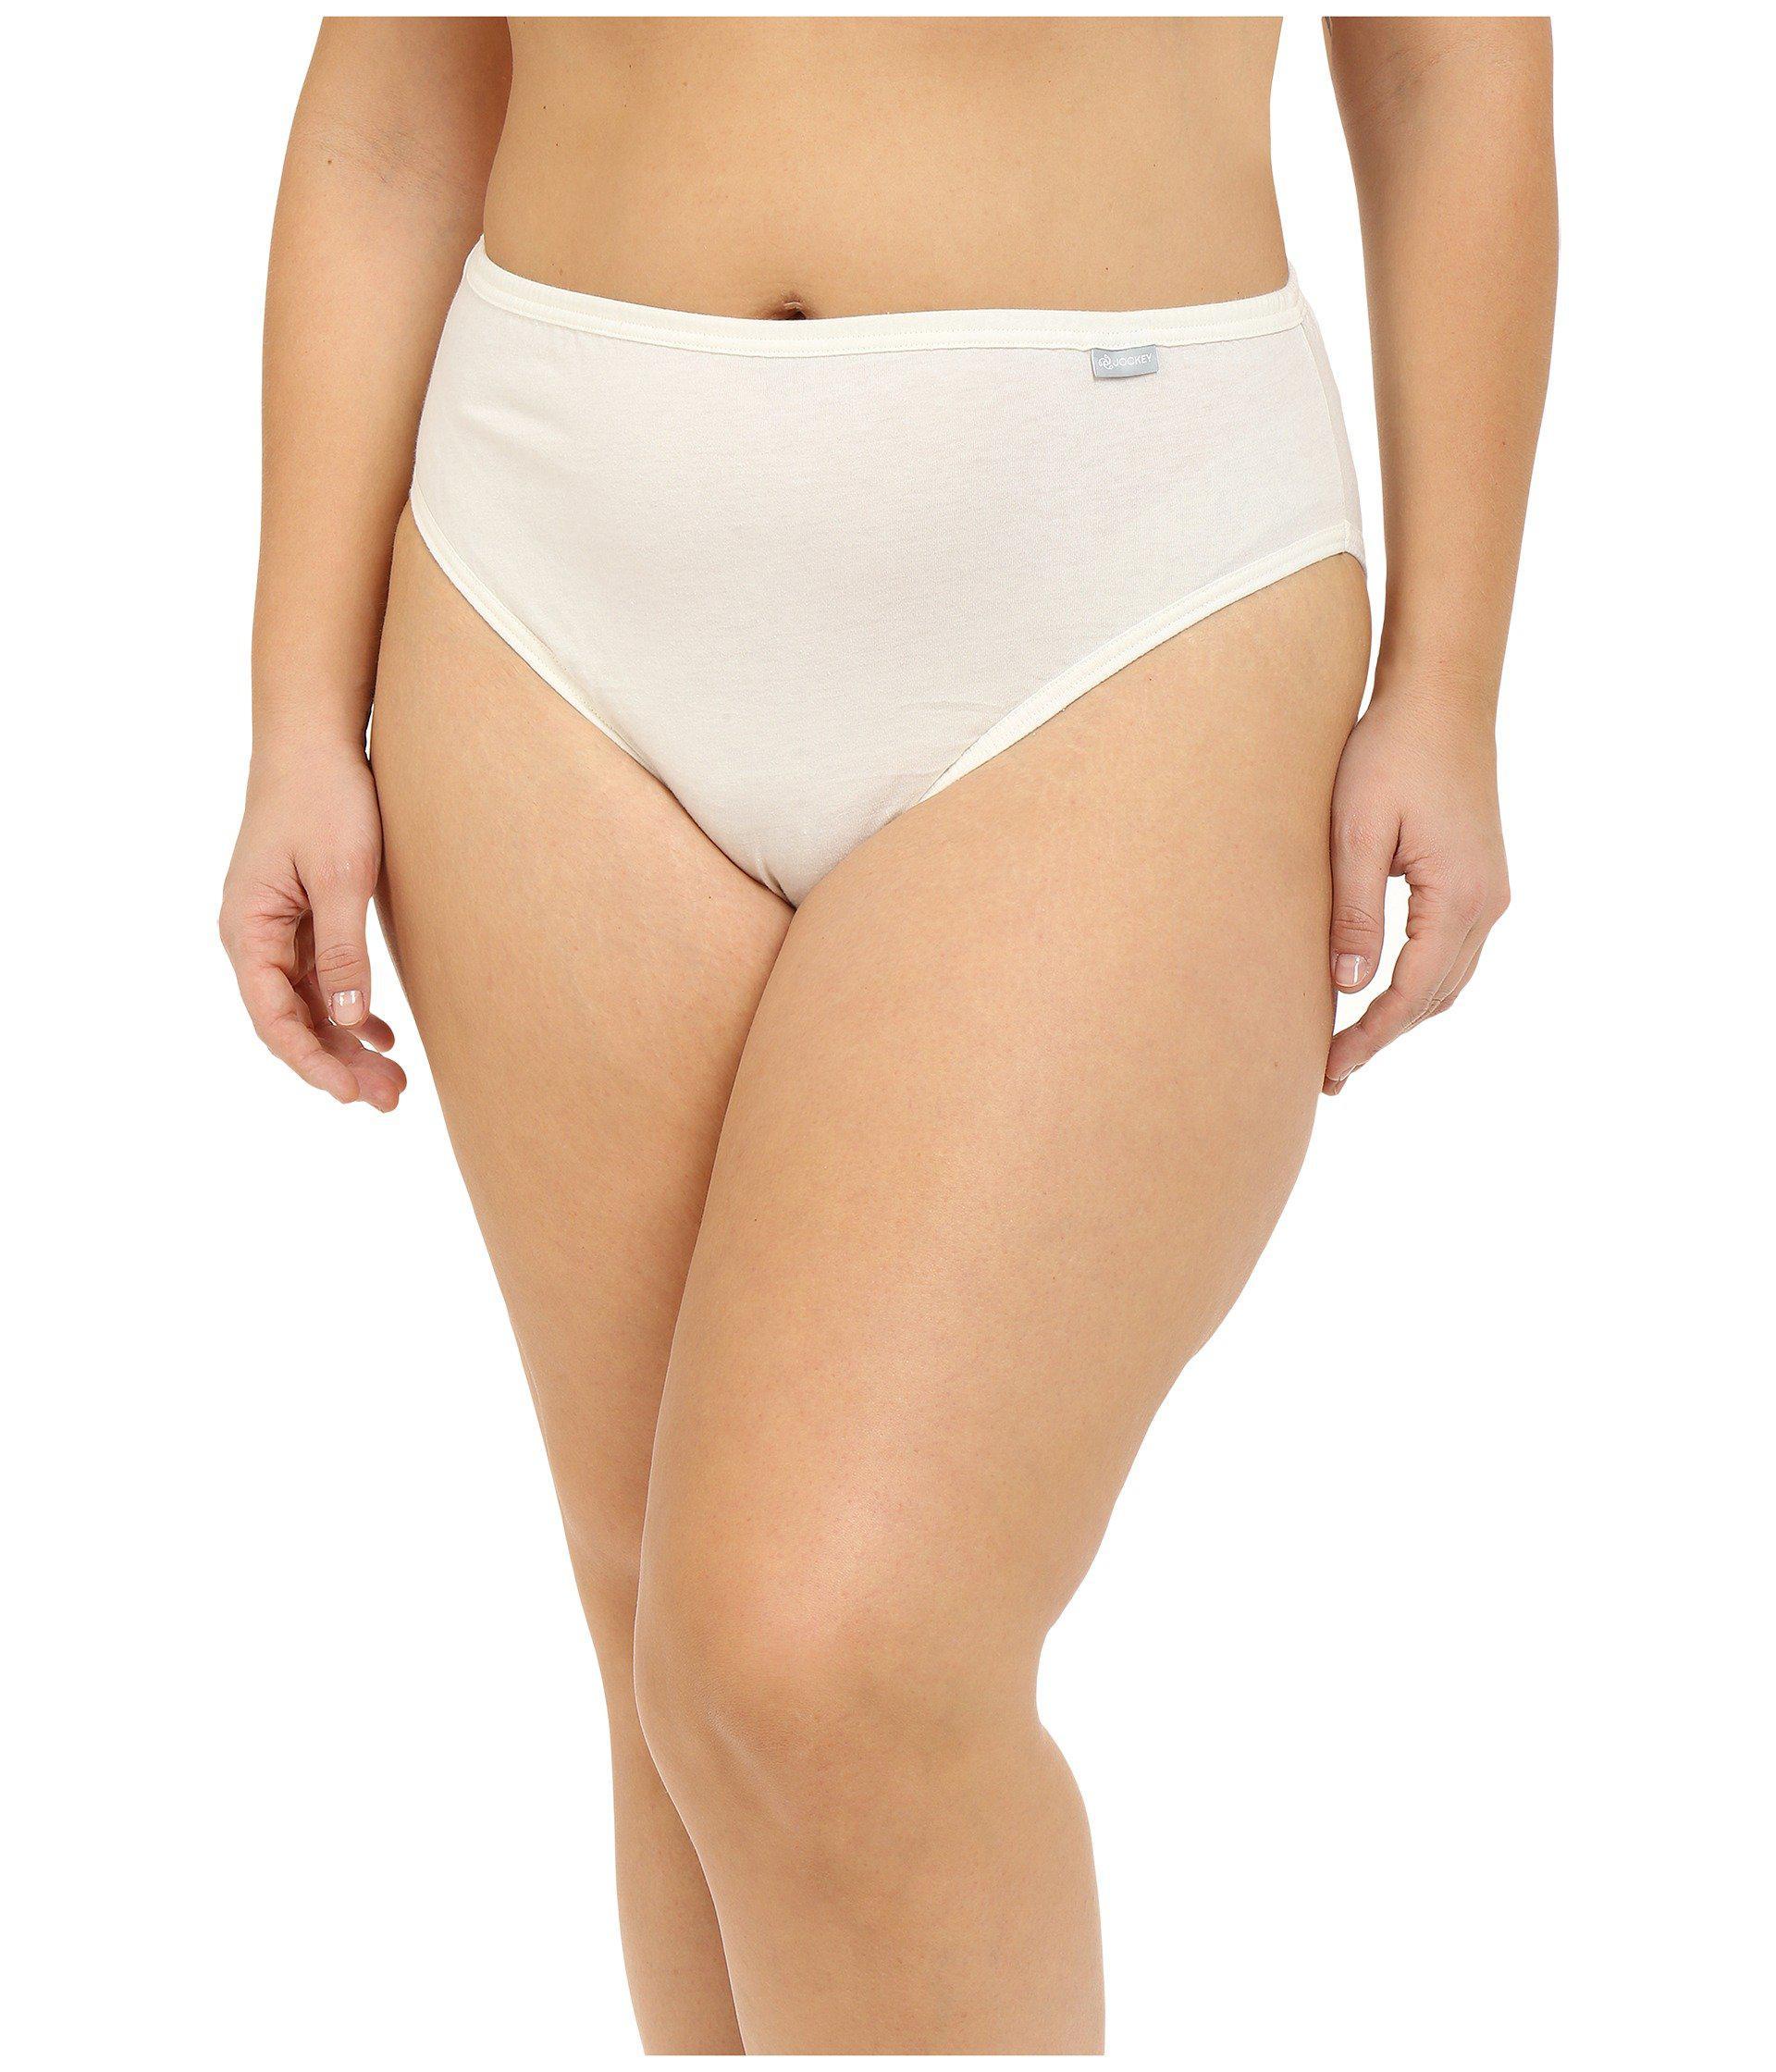 5861bfbc002 Jockey Womens Underwear Plus Size Elance Bikini - 3 Pack Christmas gift  ideas 2018